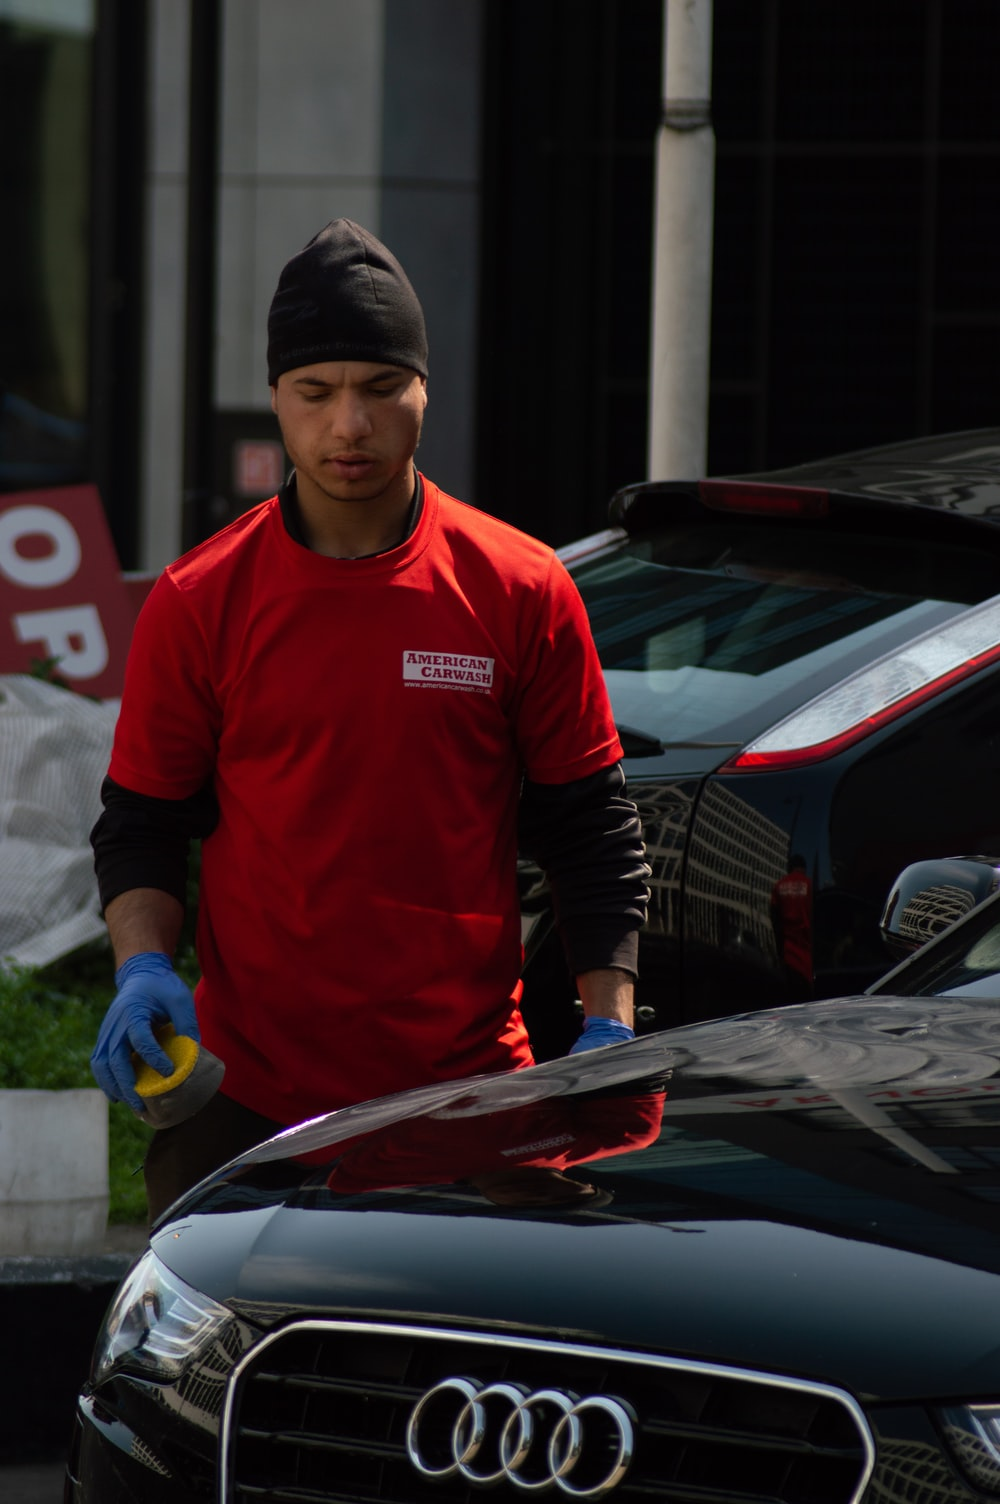 man standing beside black Audi car